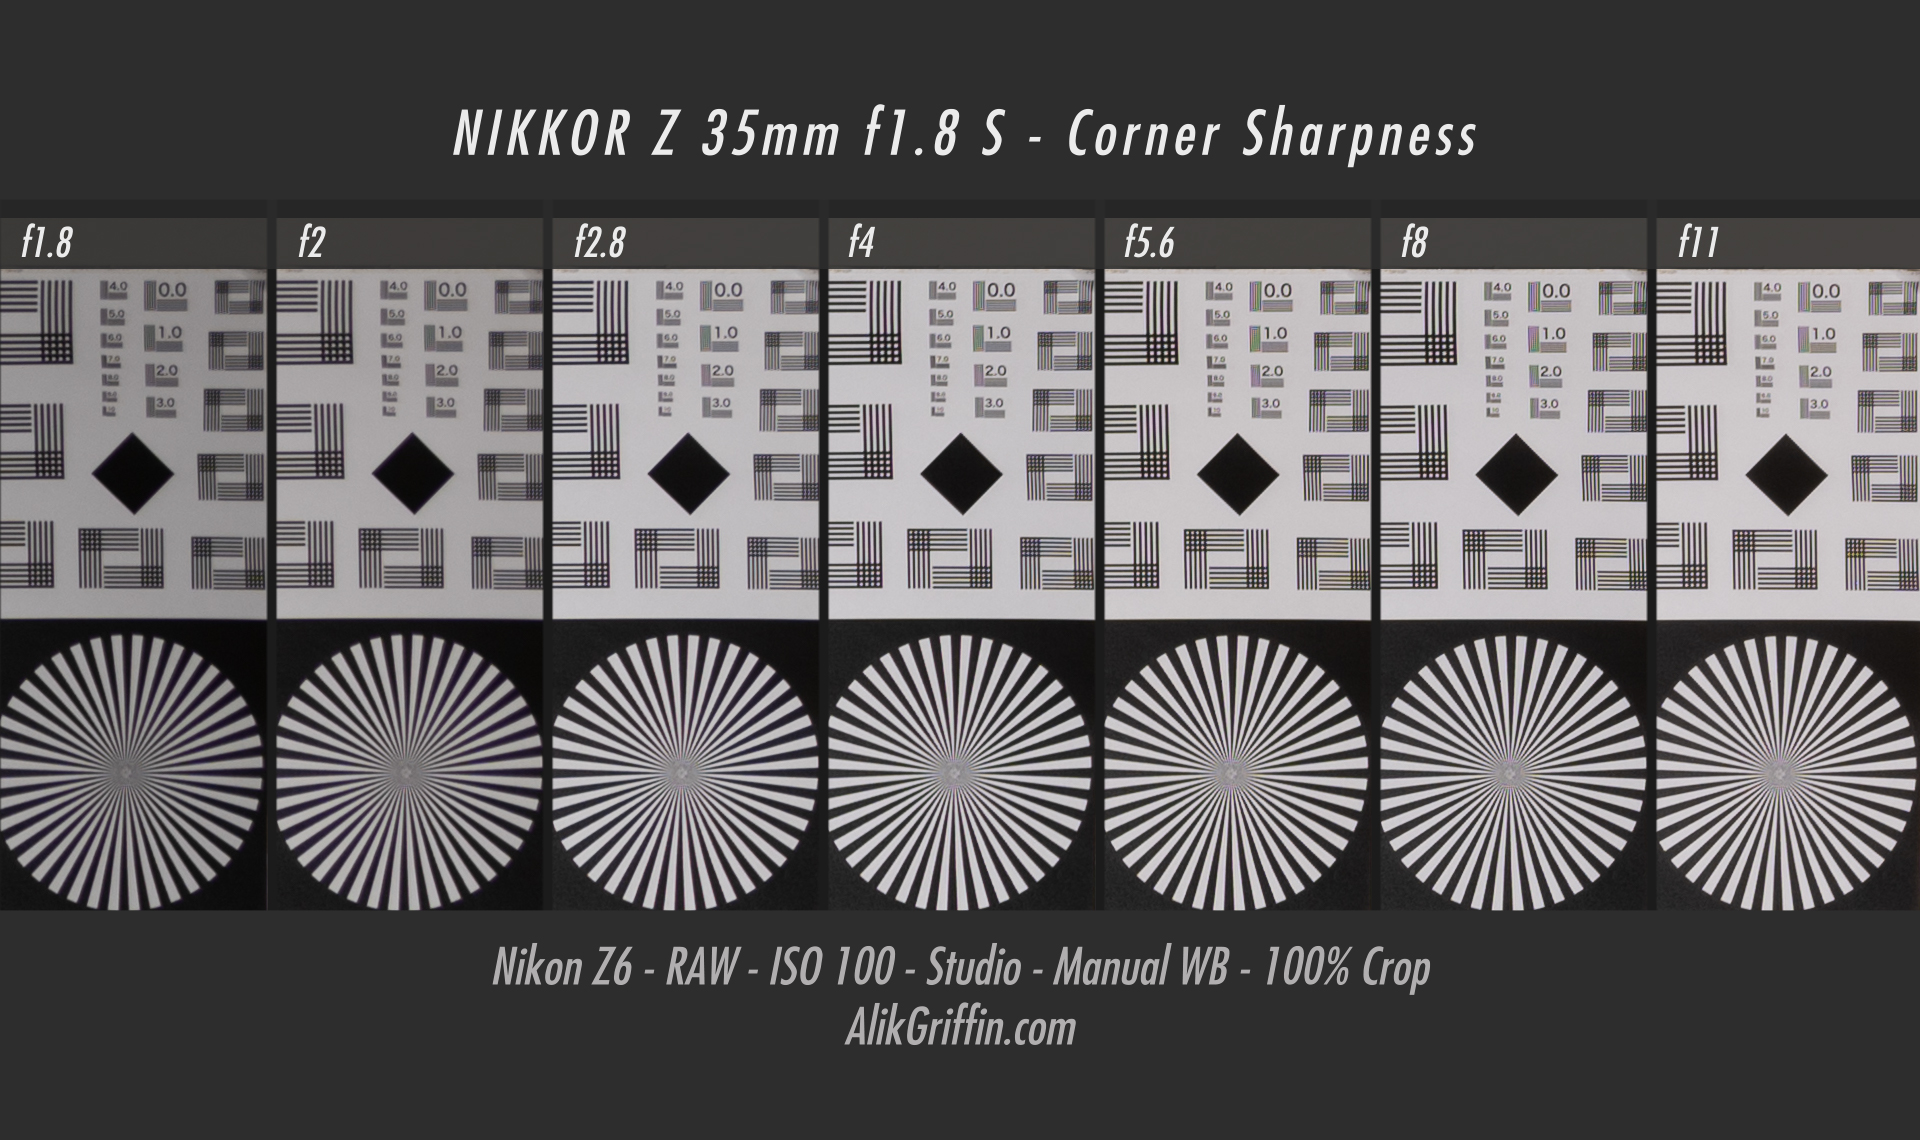 Nikon 35mm f1.8 S Corner Sharpness